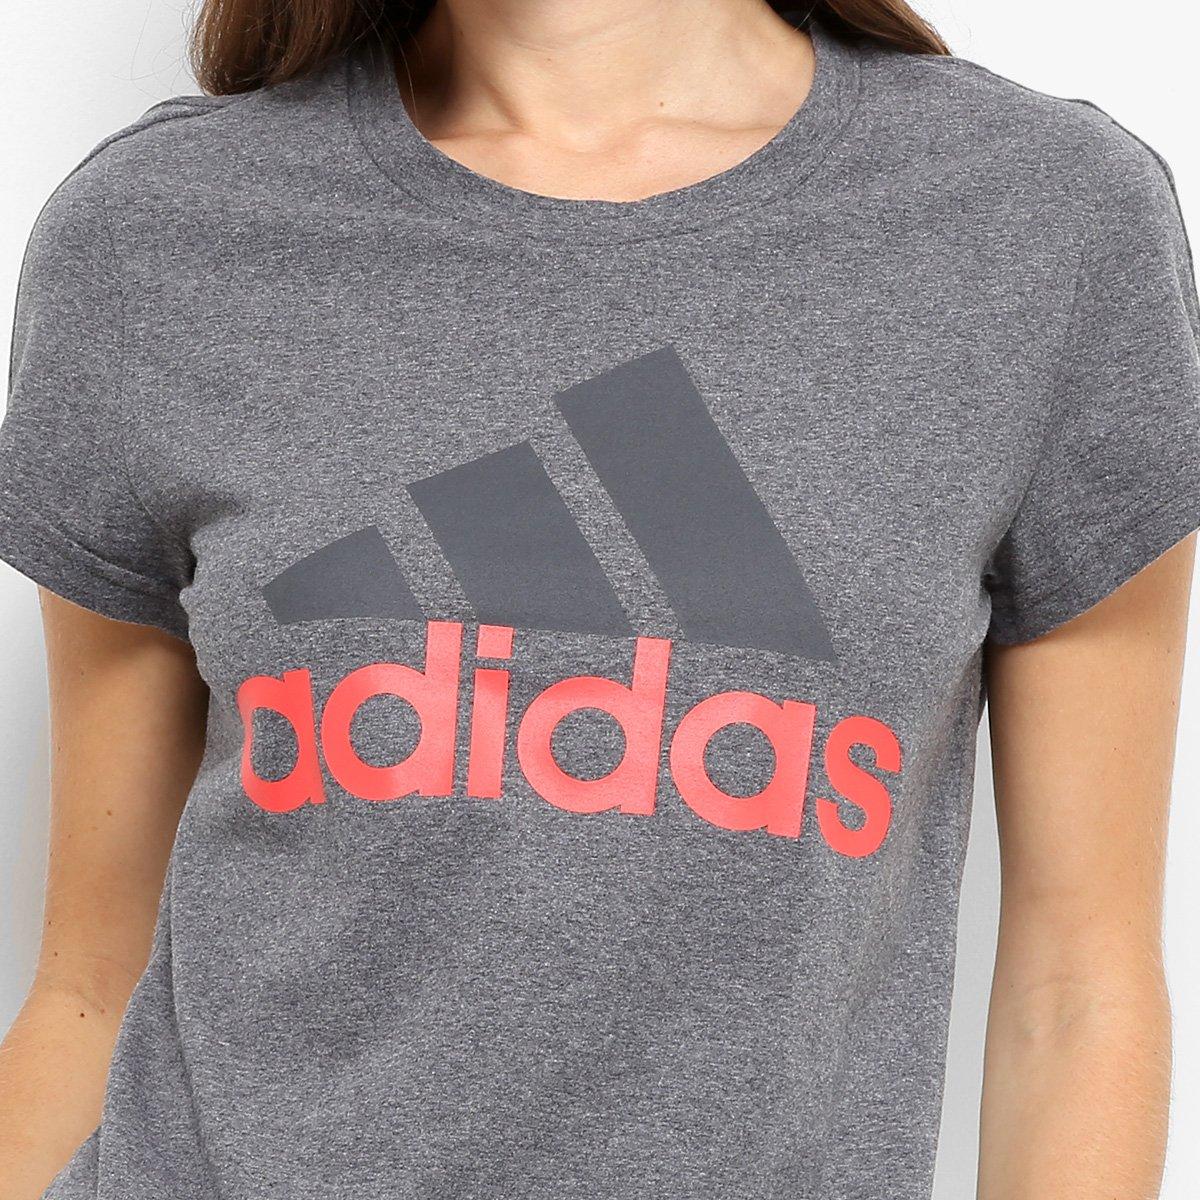 327b1ea9d2 ... 807c2faa9ea Camiseta Adidas Essentials Linear Feminina - Cinza - Compre  Agora .